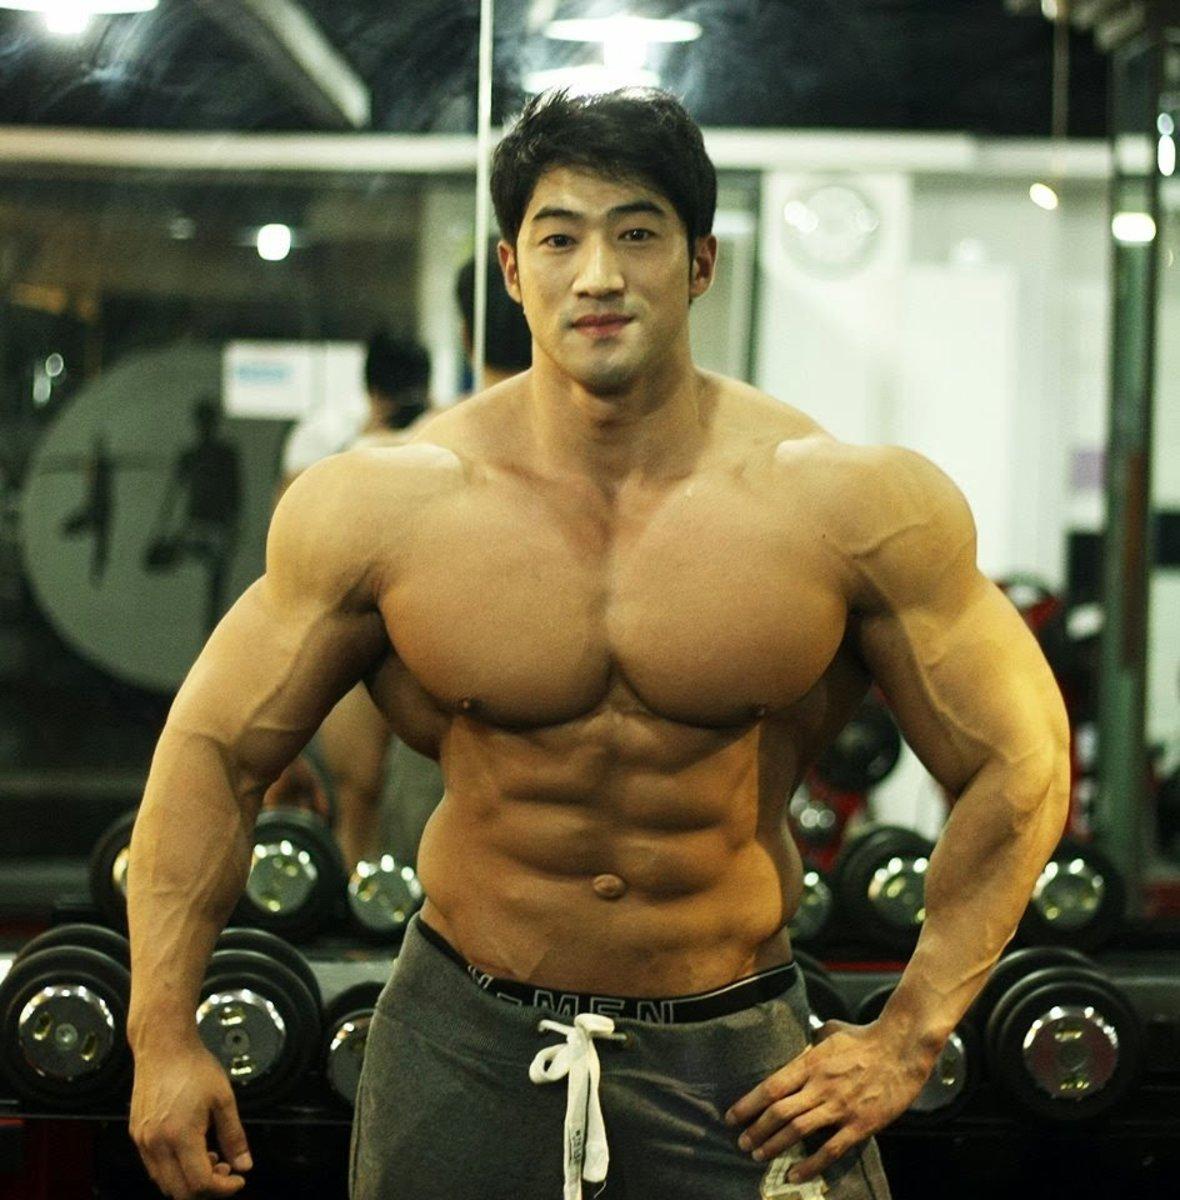 Hwang Chul Soon - Korean Bodybuilder and Fitness Model